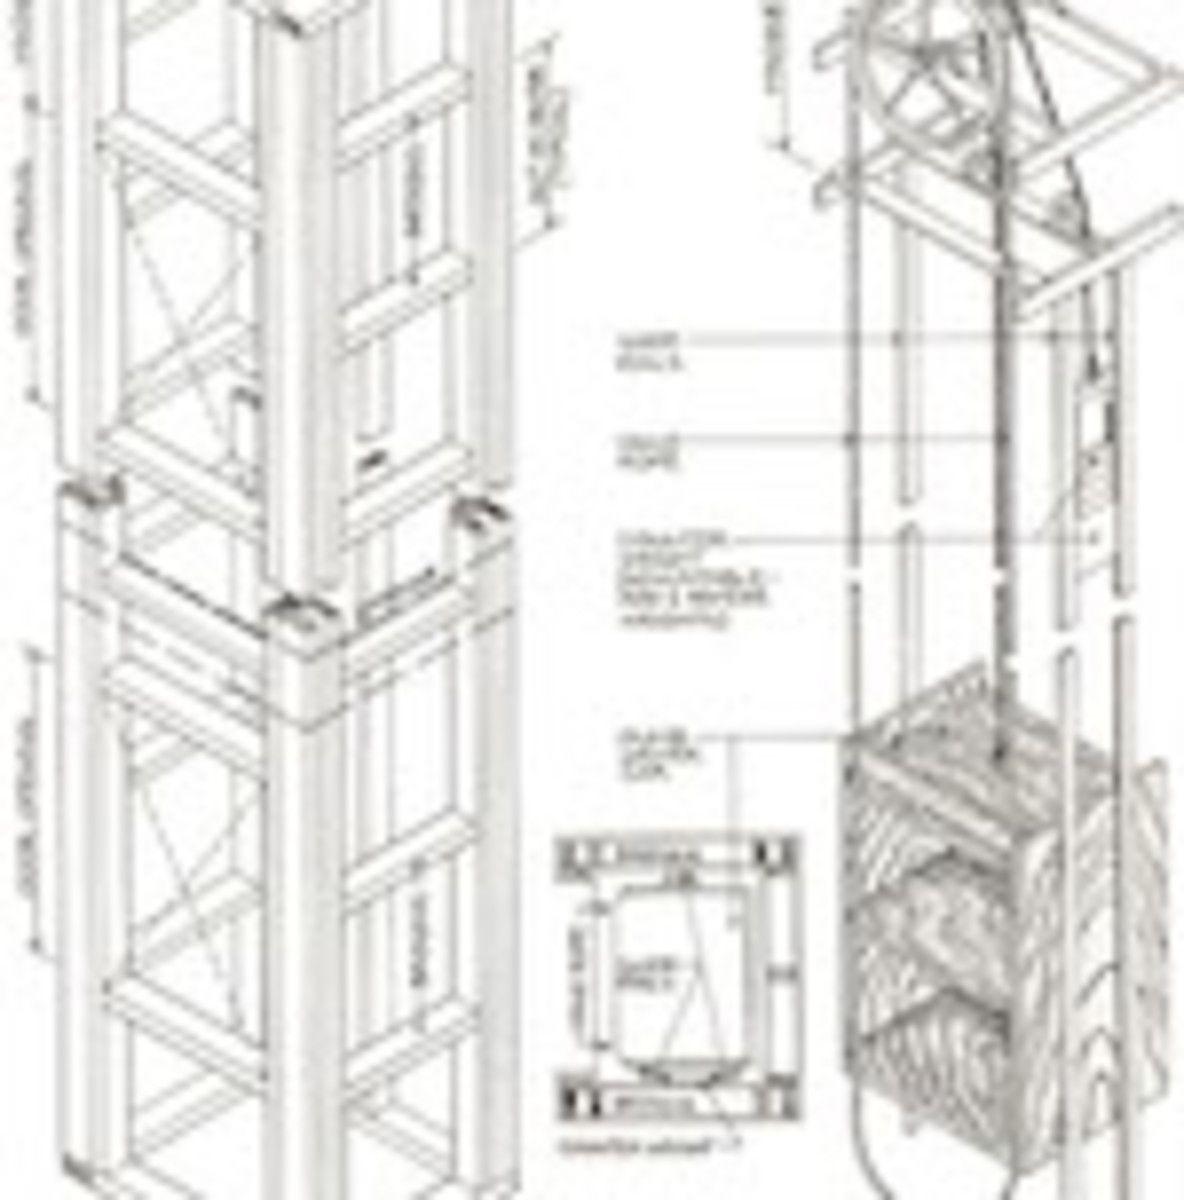 Manual Dumbwaiters Row House Restoration Peoria